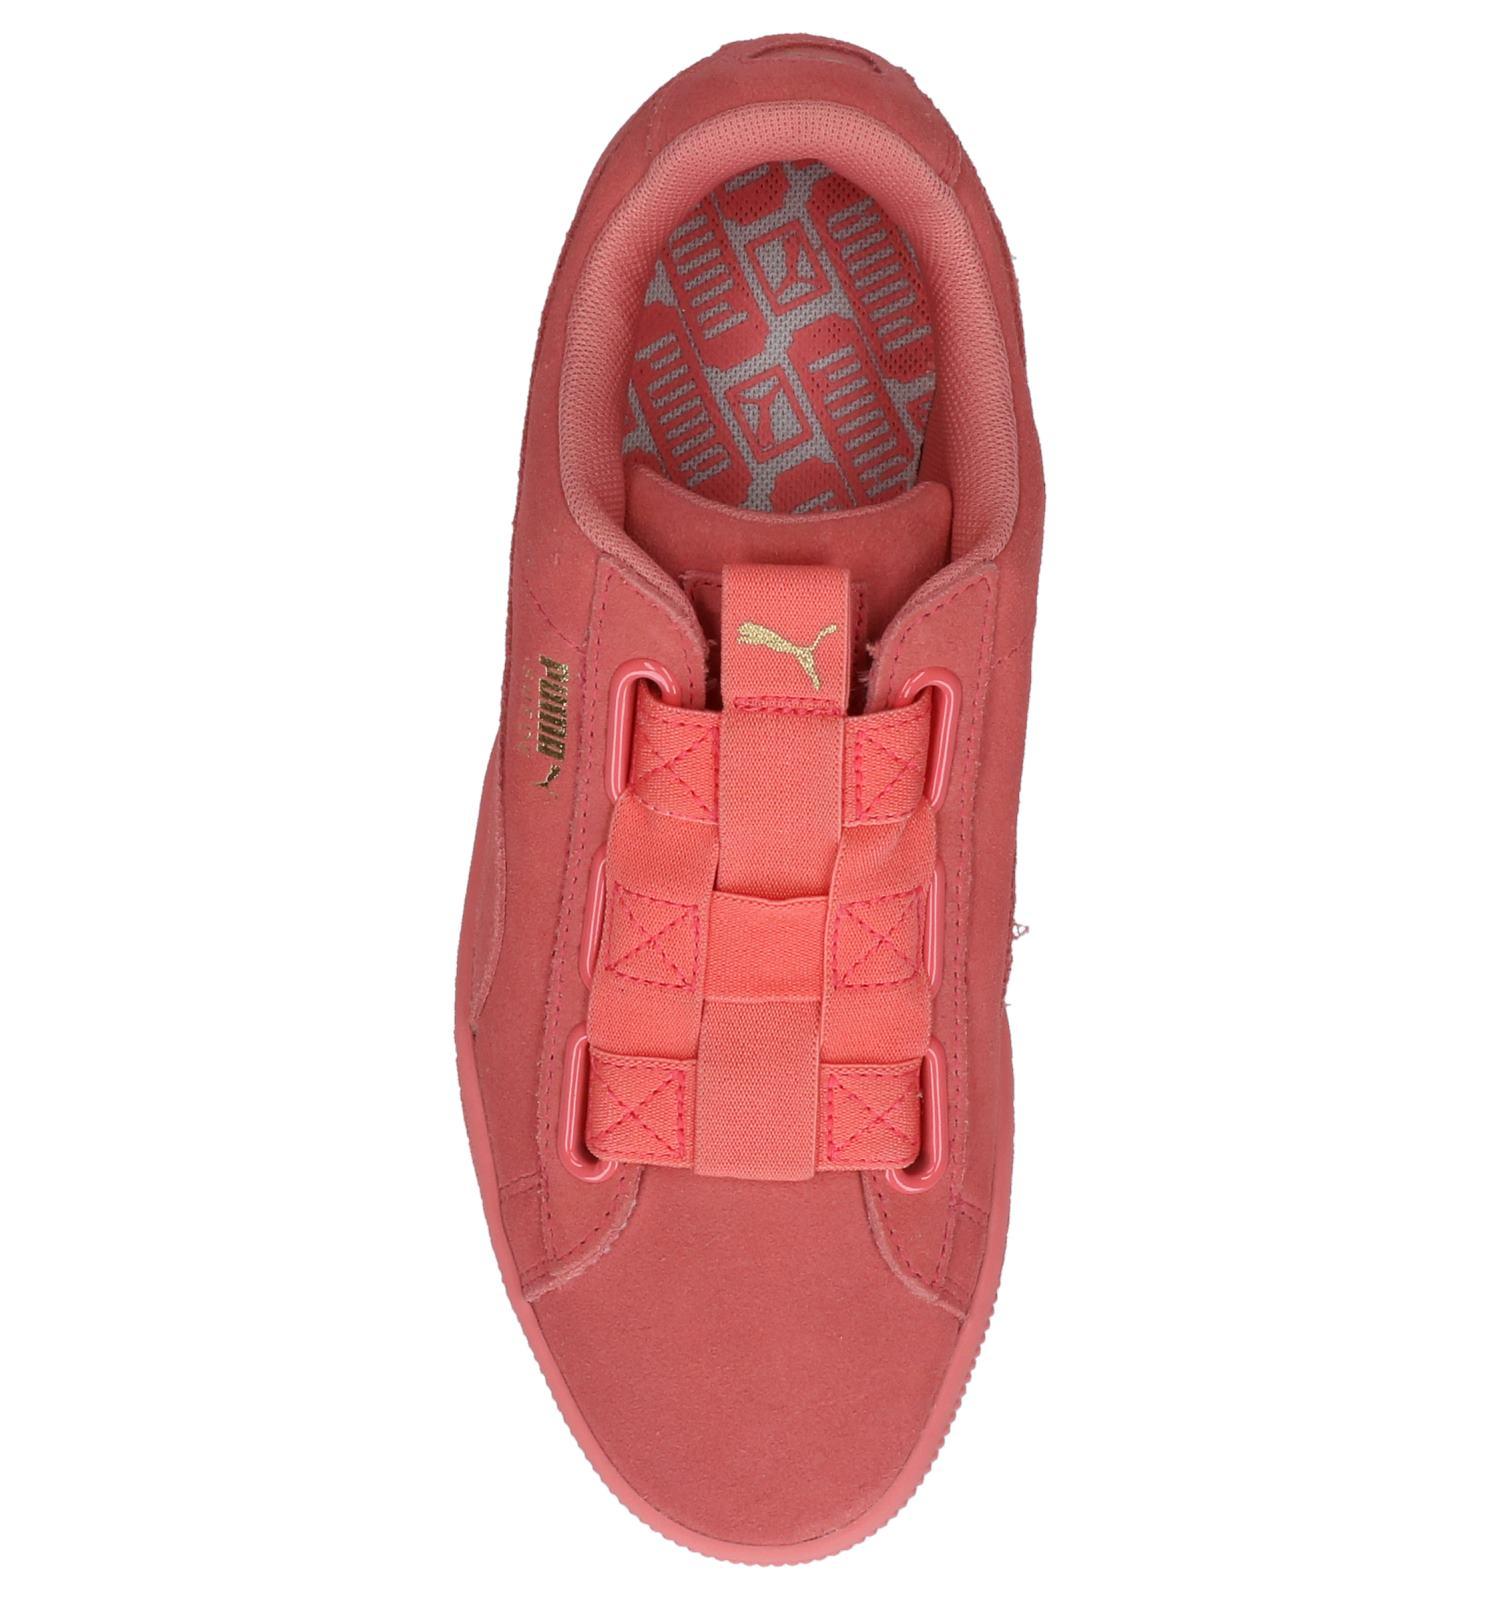 Roze Sneakers Puma Suede Maze | SCHOENENTORFS.NL | Gratis